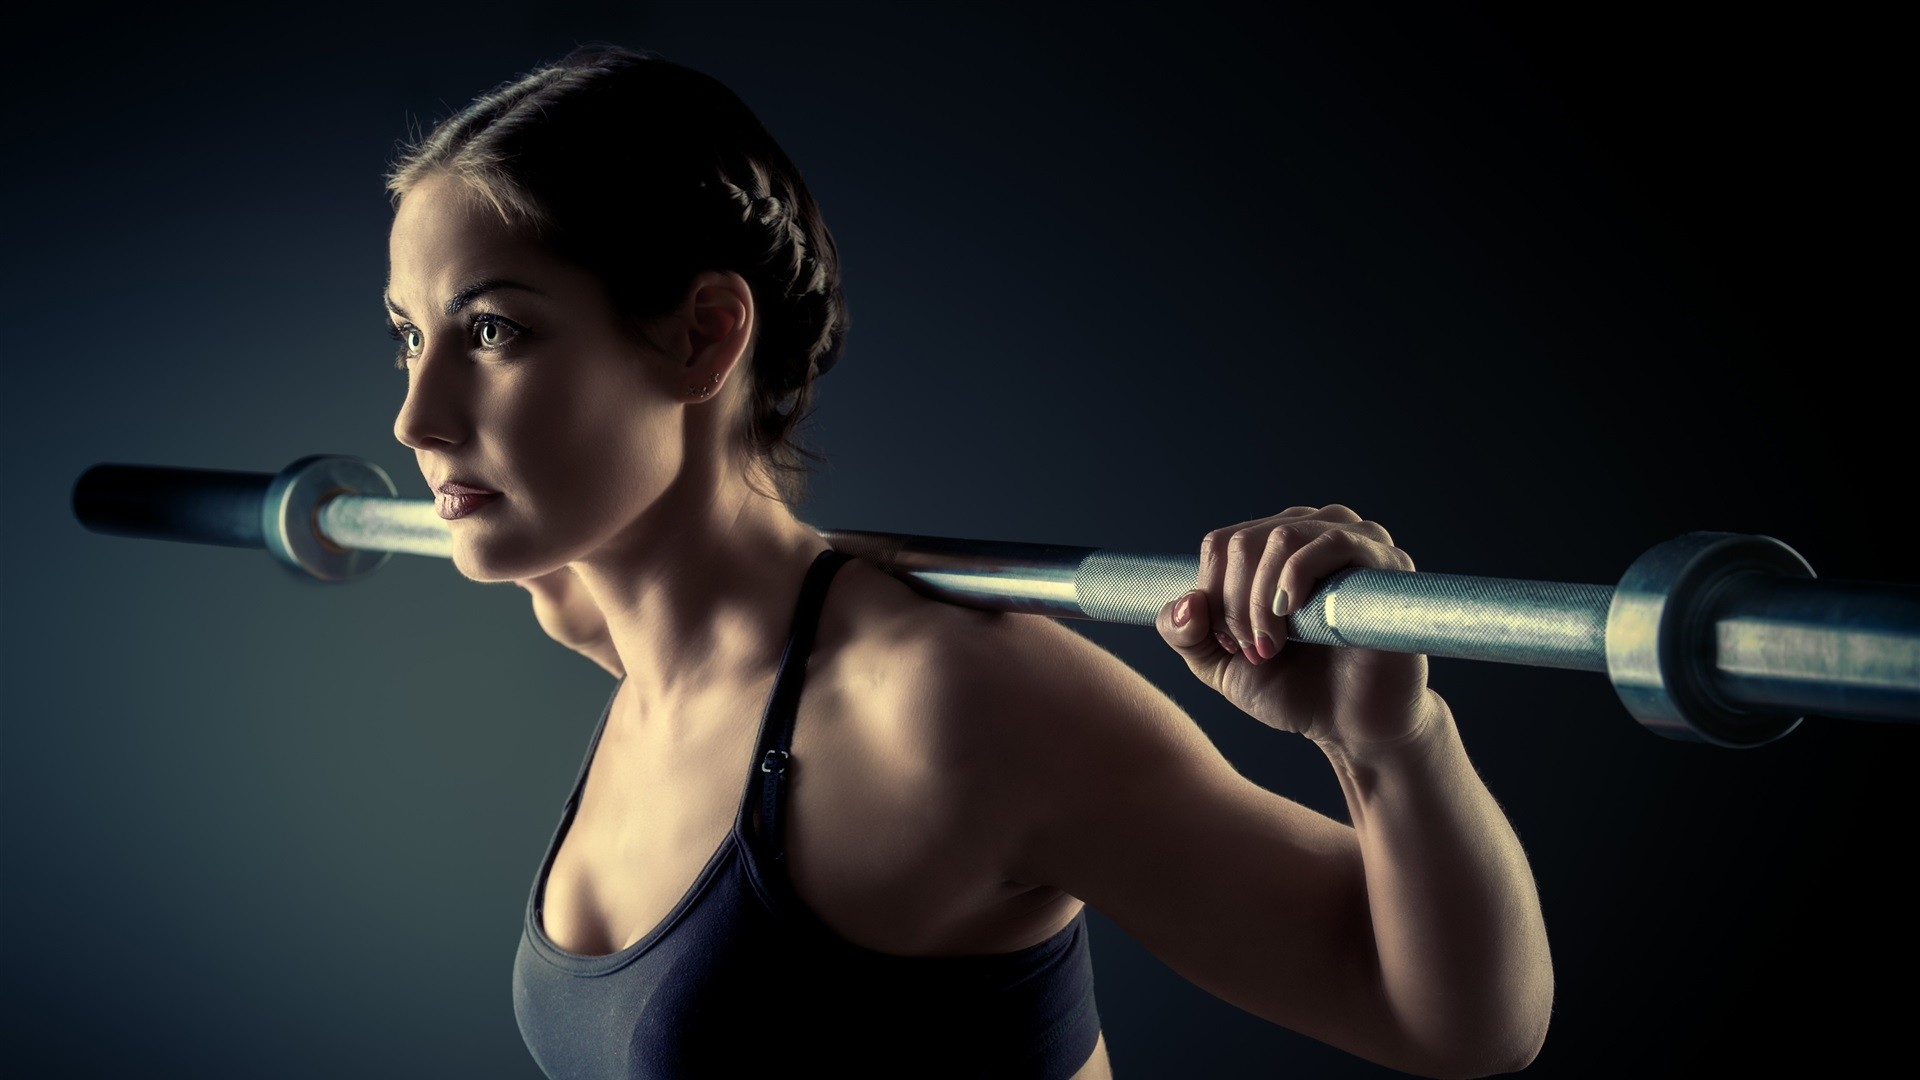 Fitness Wallpaper theme